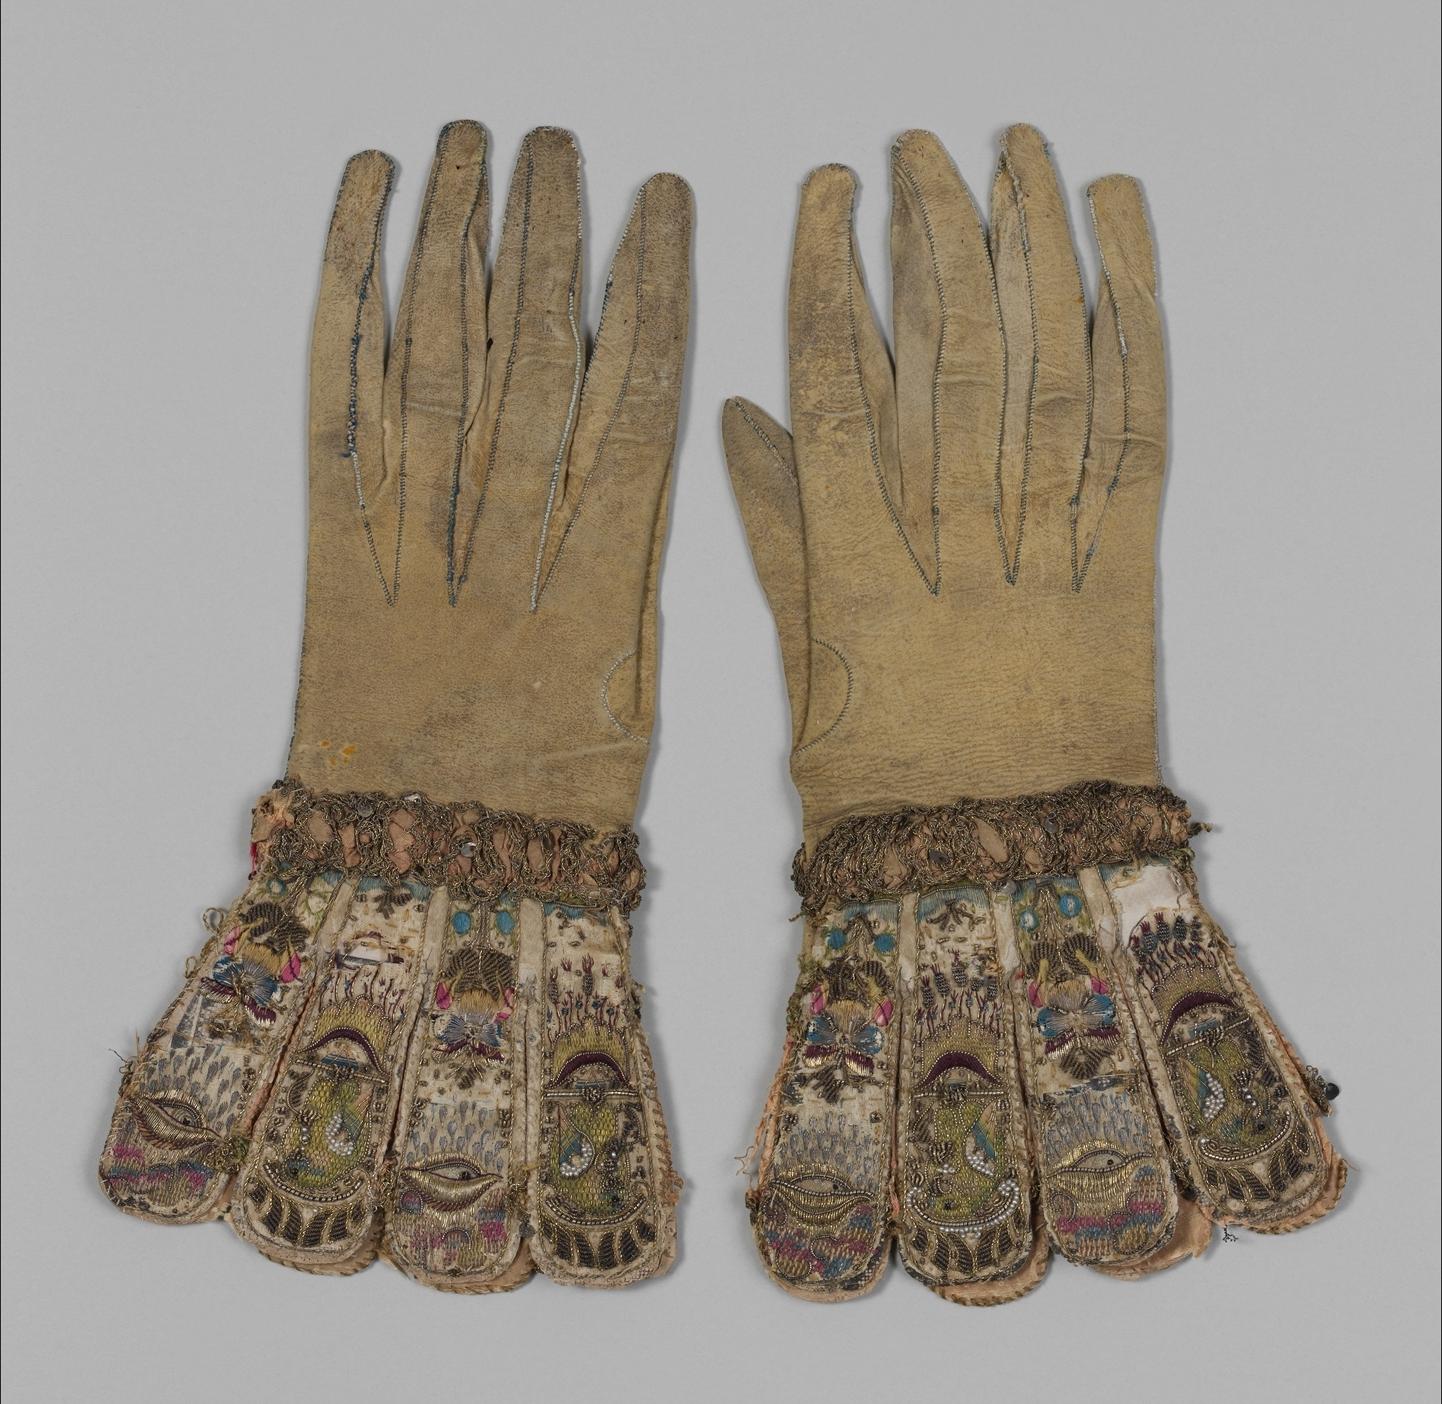 Pair of gloves , ca. 1600  Metropolitan Museum of Art (28.220.7, .8)